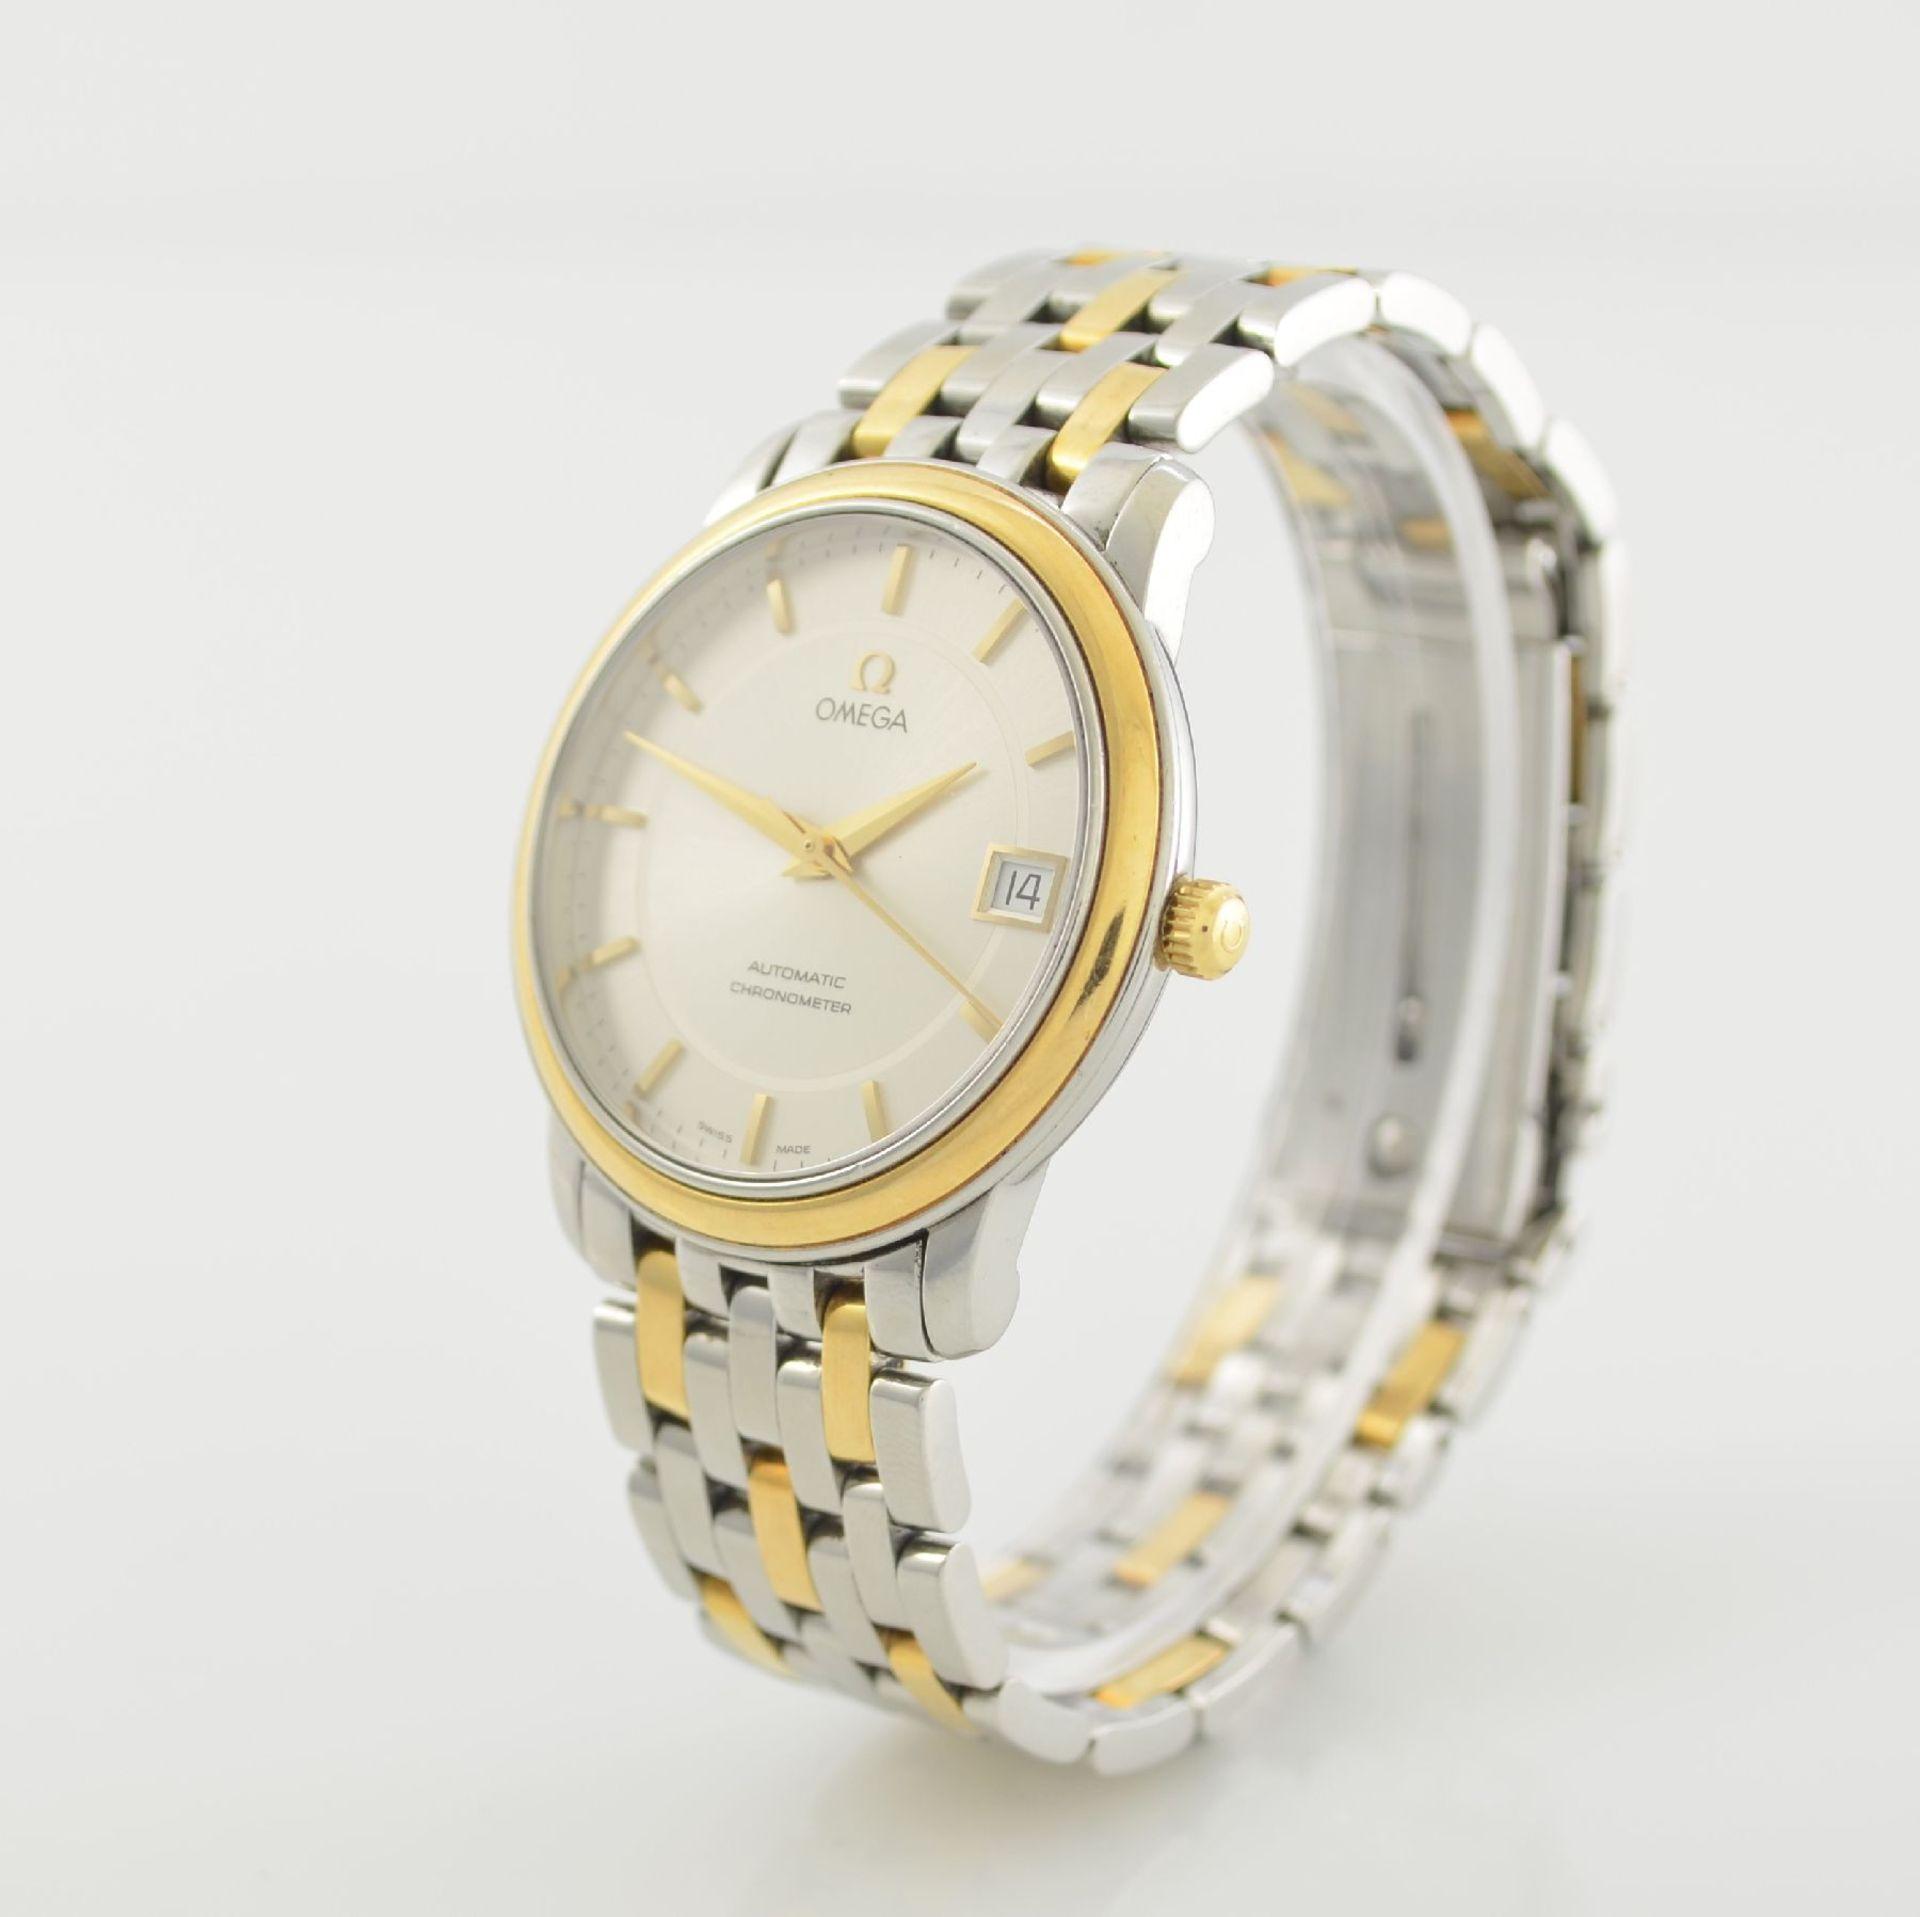 OMEGA Chronometer Herrenarmbanduhr in Edelstahl/Gold Ref. 168 1050, Schweiz um 2006, Automatik, - Bild 3 aus 7